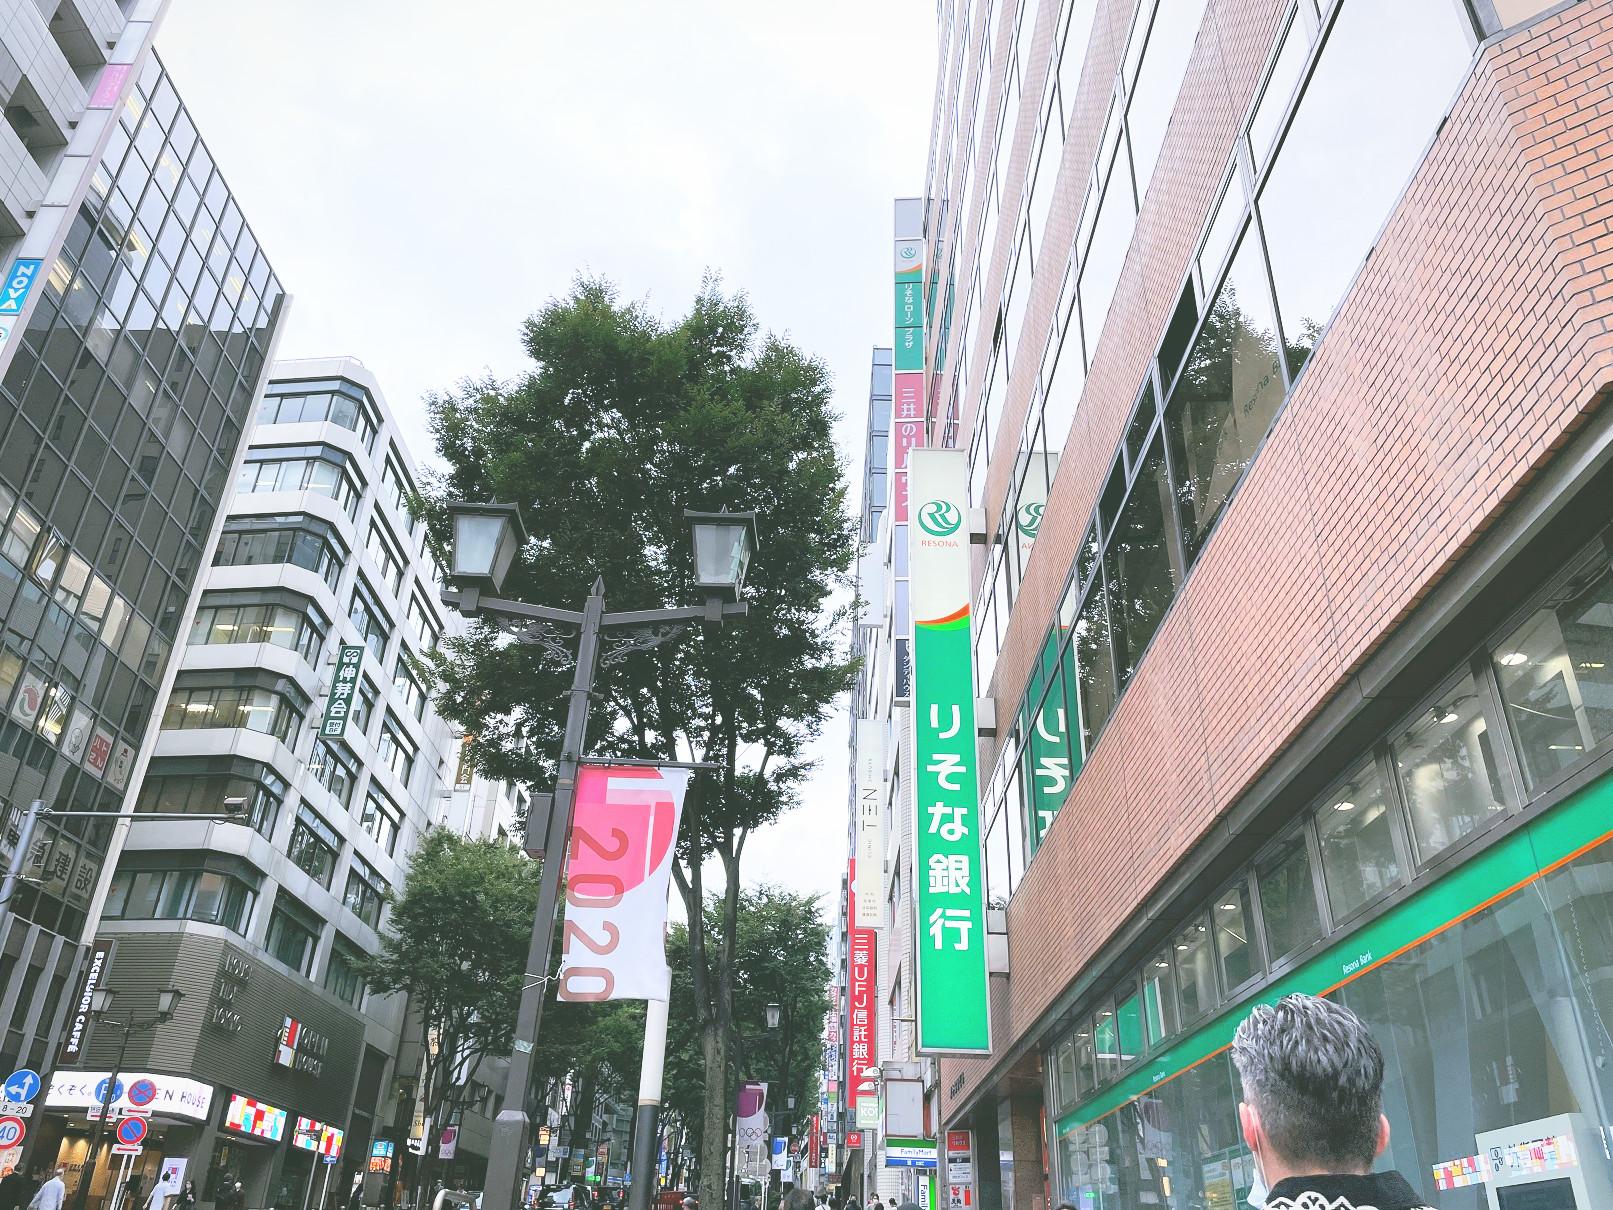 CLEMOREクレモール渋谷クリスティーナフェイシャルエステ体験談口コミレポ